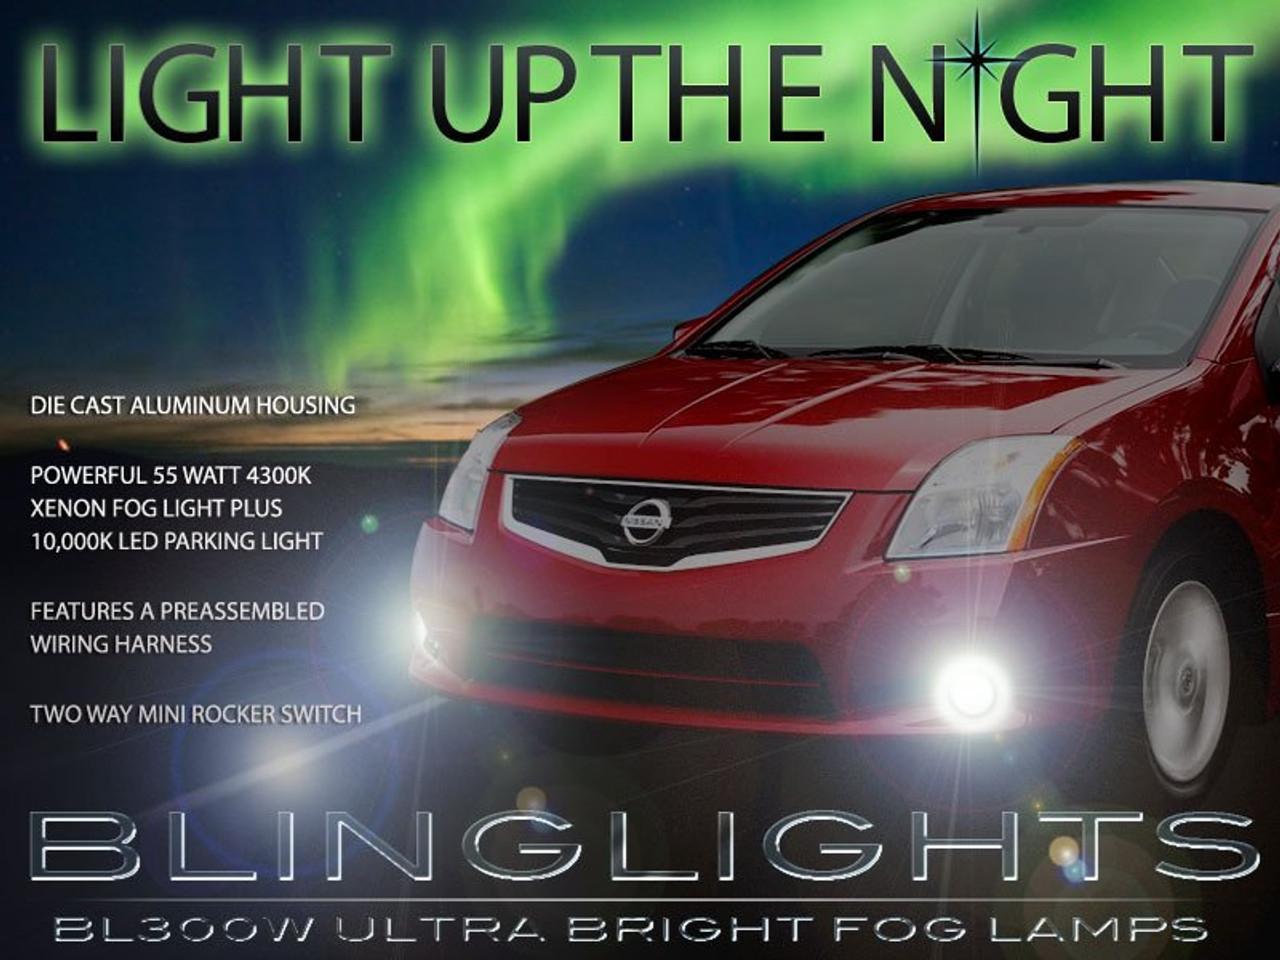 medium resolution of 2007 2008 2009 2010 2011 2012 nissan sentra xenon led fog lamps driving lights foglamps kit blinglights com